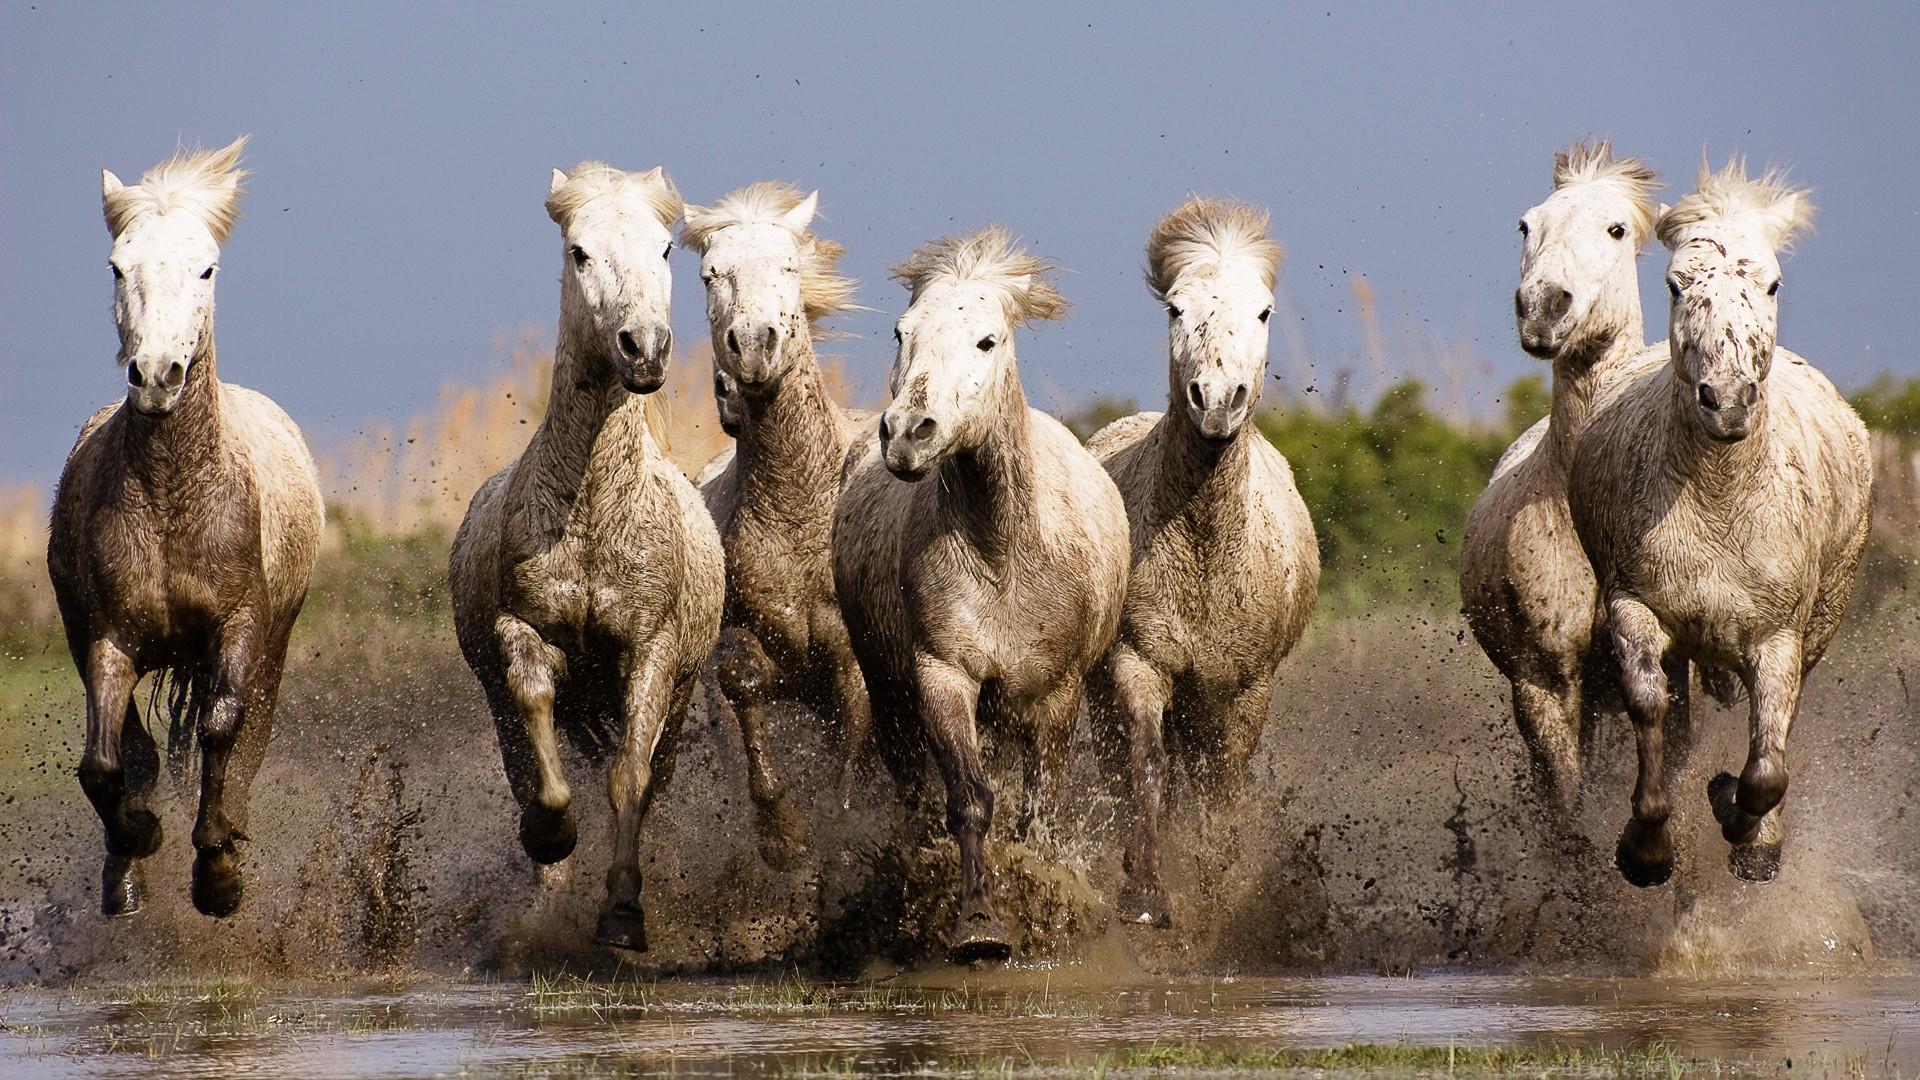 Wallpaper 1920x1080 Px Animals Horse Nature Running